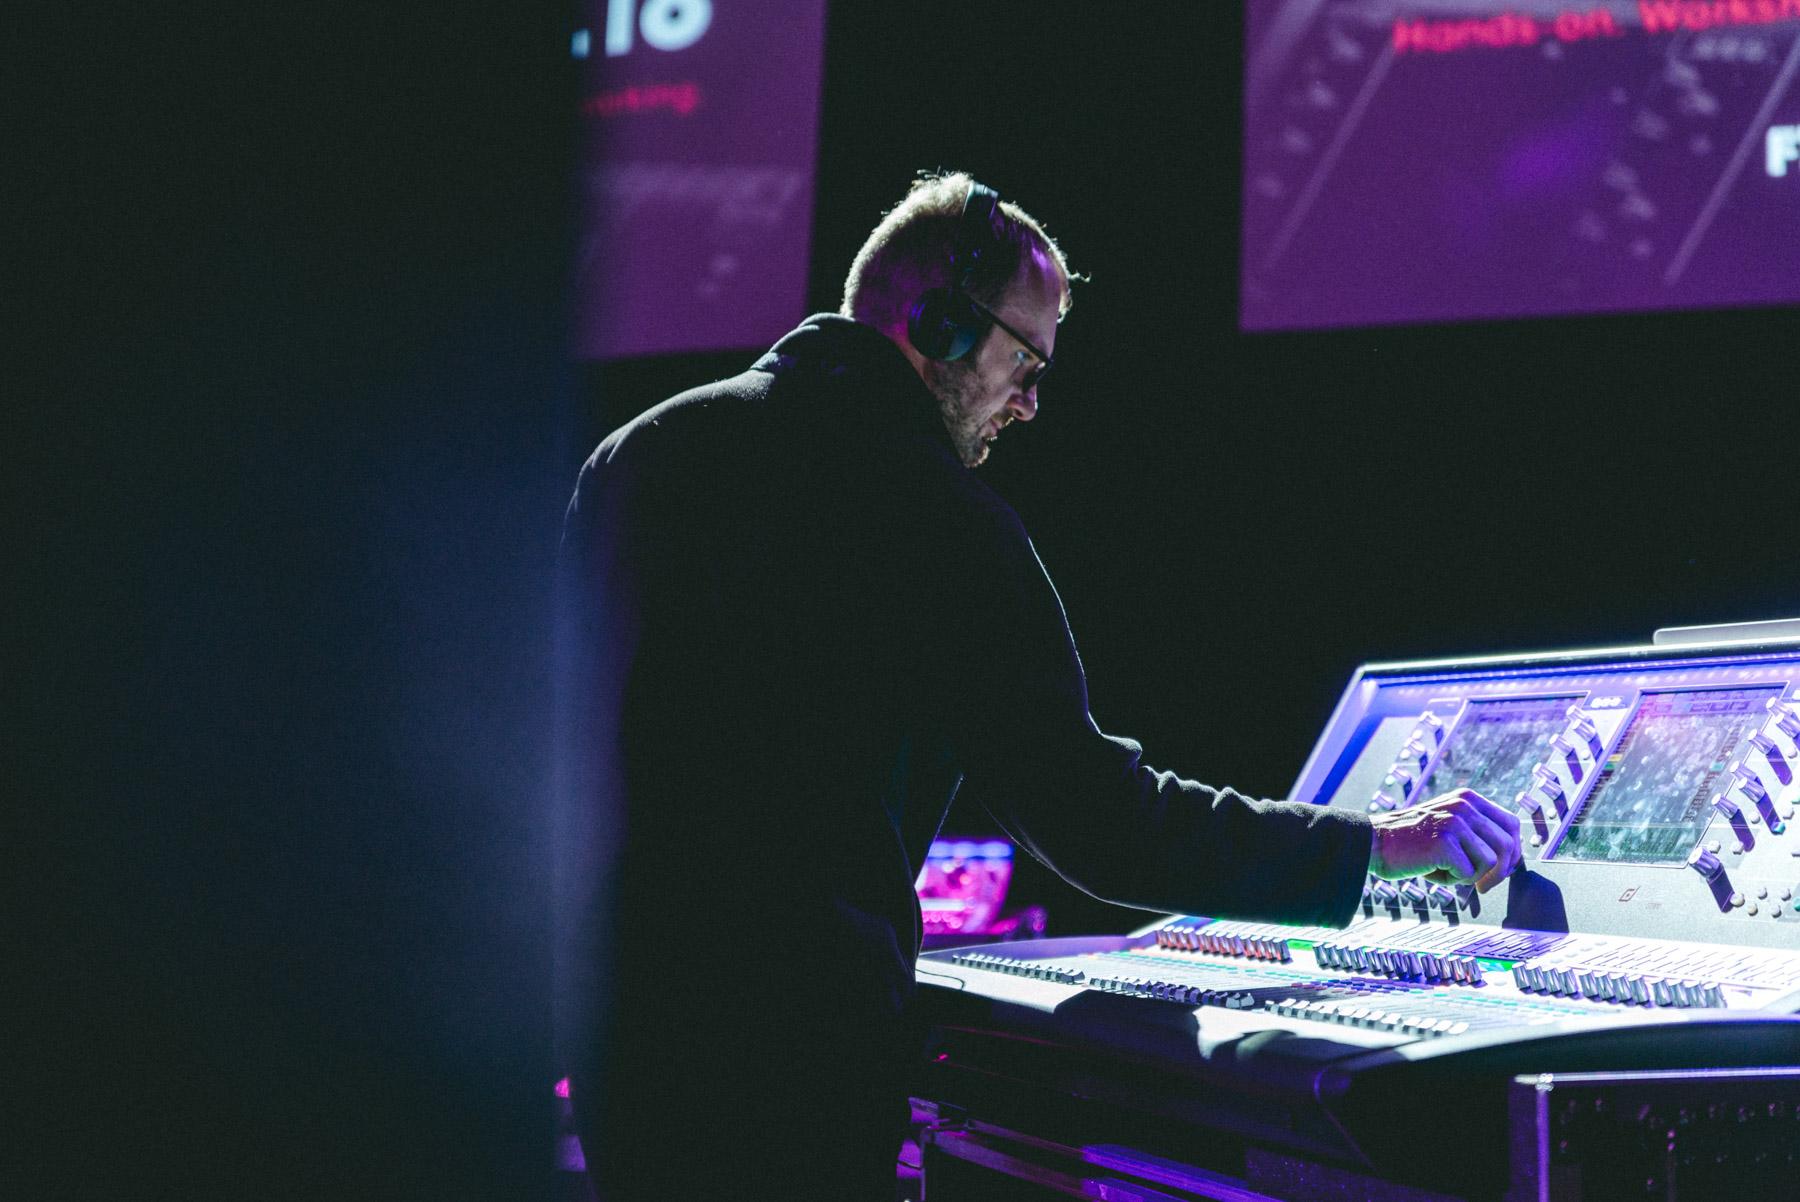 f1-sound-company-13.jpg